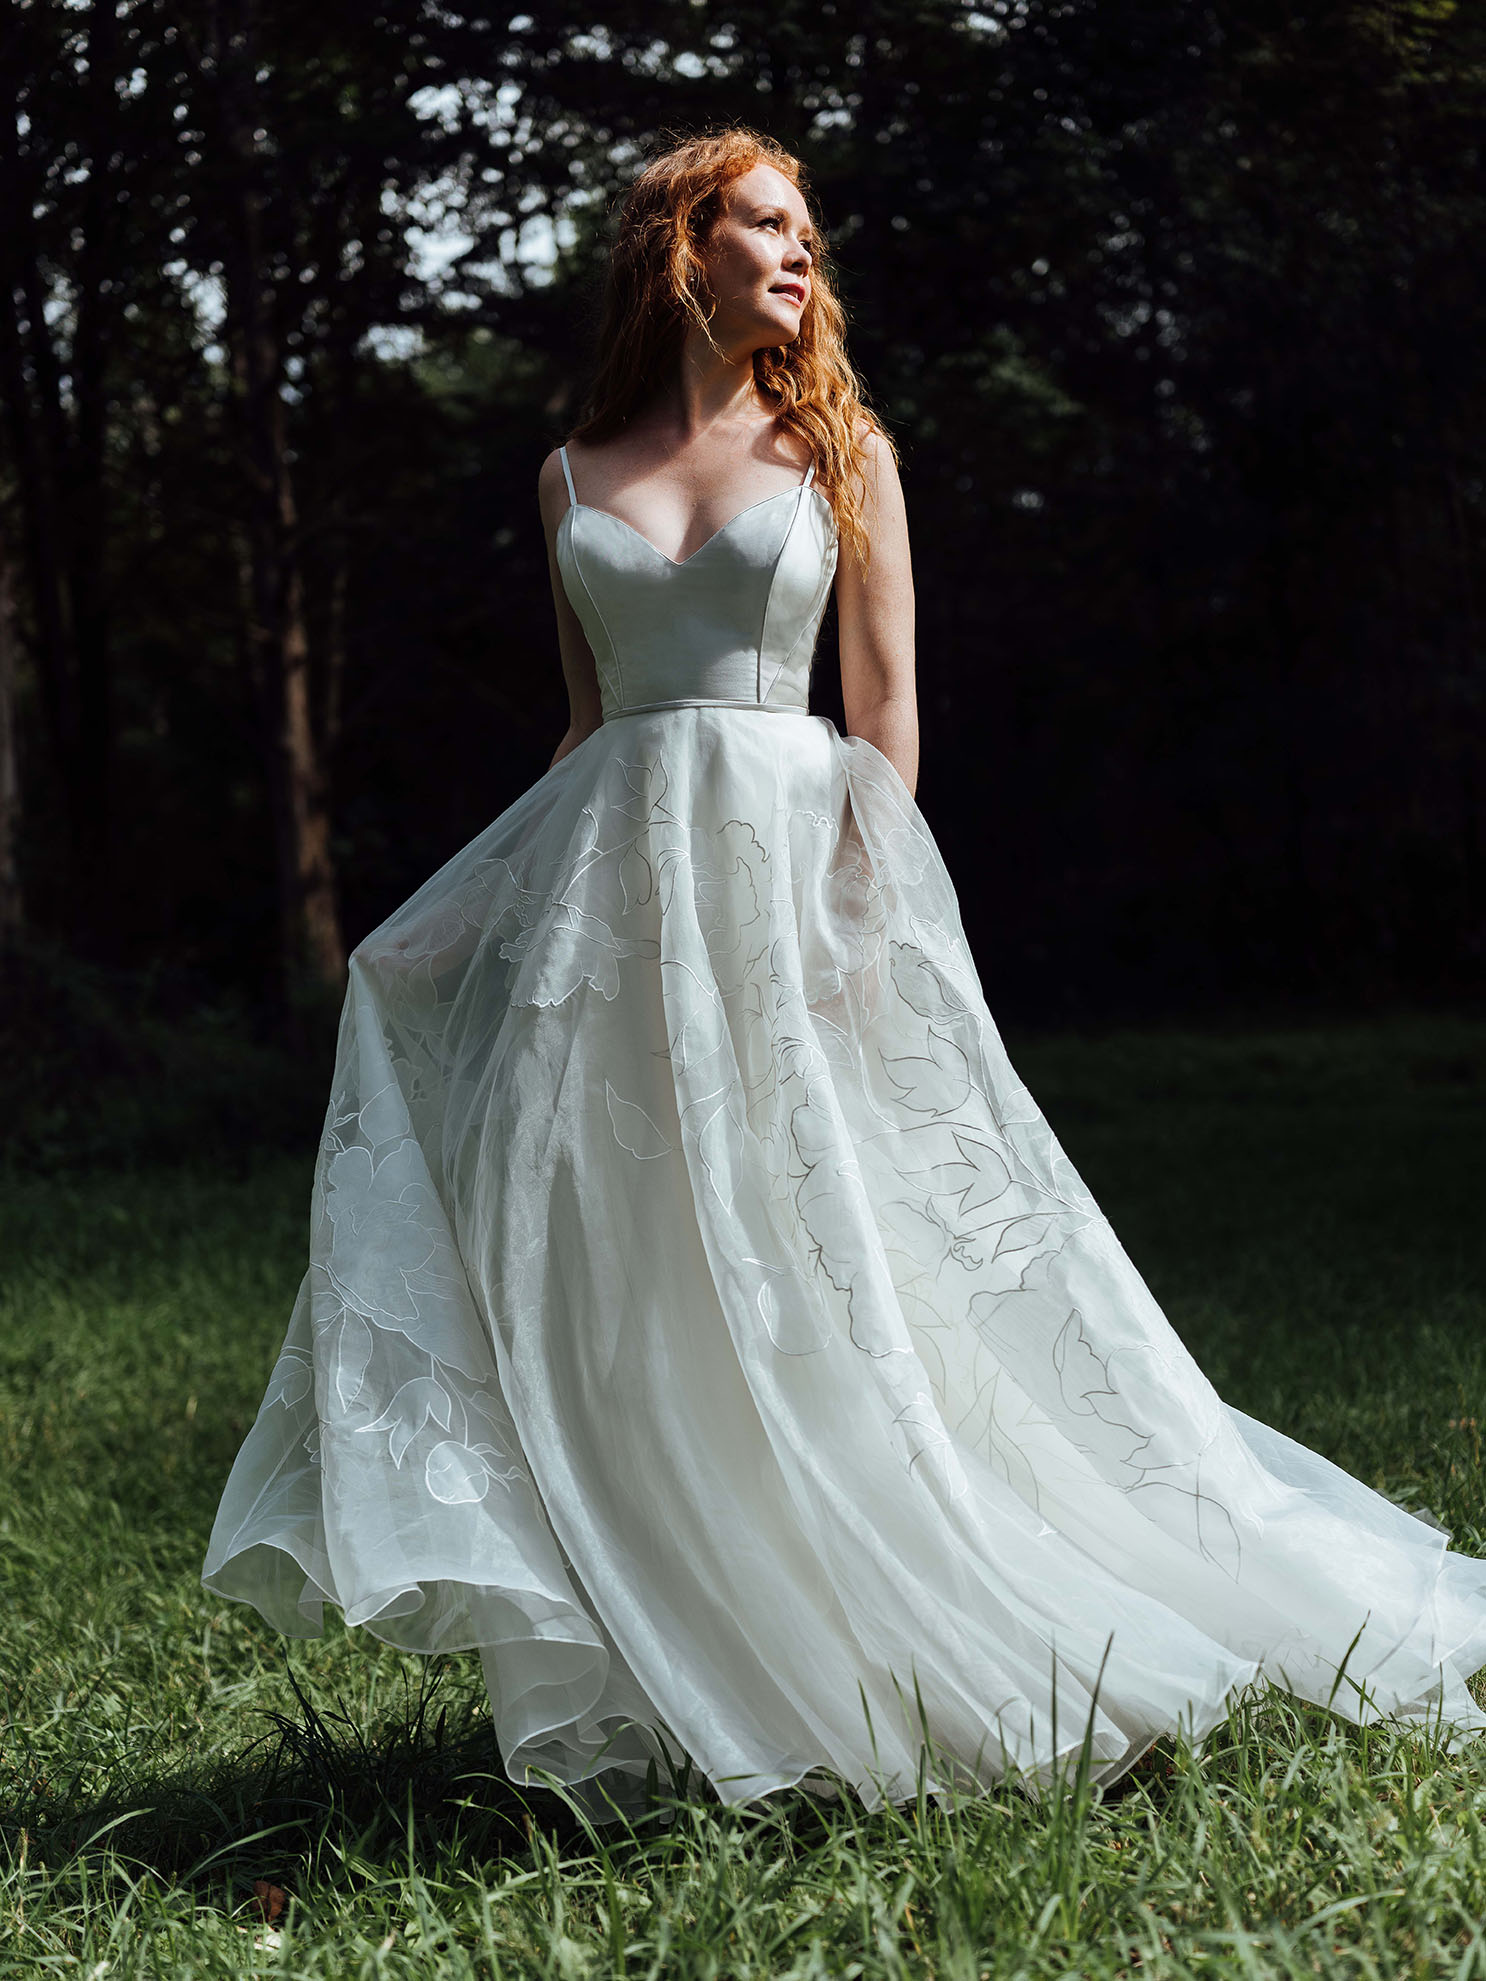 WSPCo-Gather-Greene-Rebecca-Schoneveld-Bridal-455_soft_romantic_wedding_dress_ideas_flower_pattern.jpg